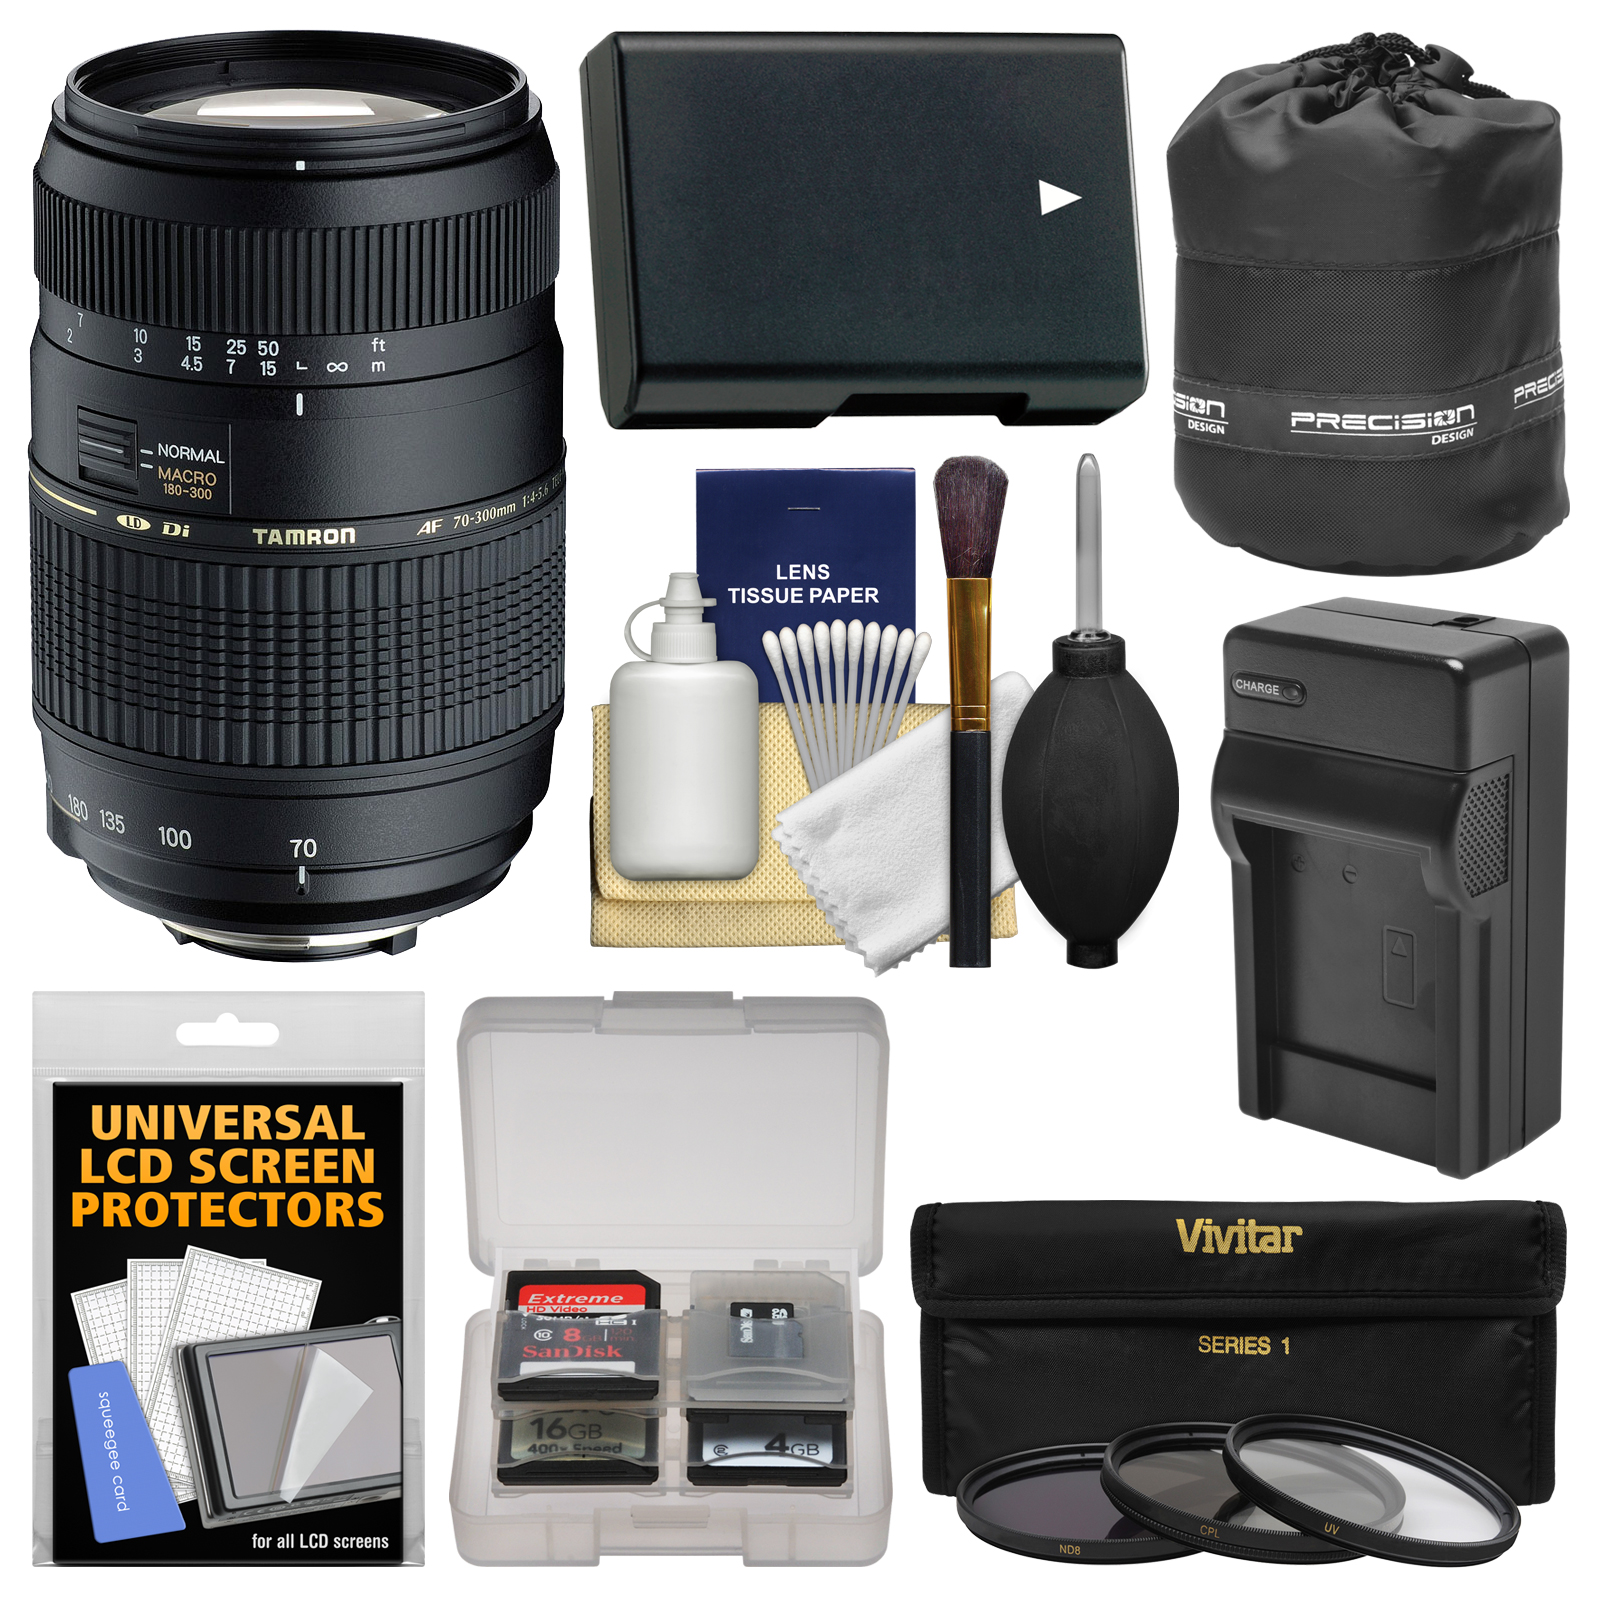 Tamron 70 300mm F 4 56 Di LD Macro 12 Zoom Lens BIM With EN EL14 Battery Charger 3 Filters Pouch Kit For Nikon D3200 D3300 D3400 D5300